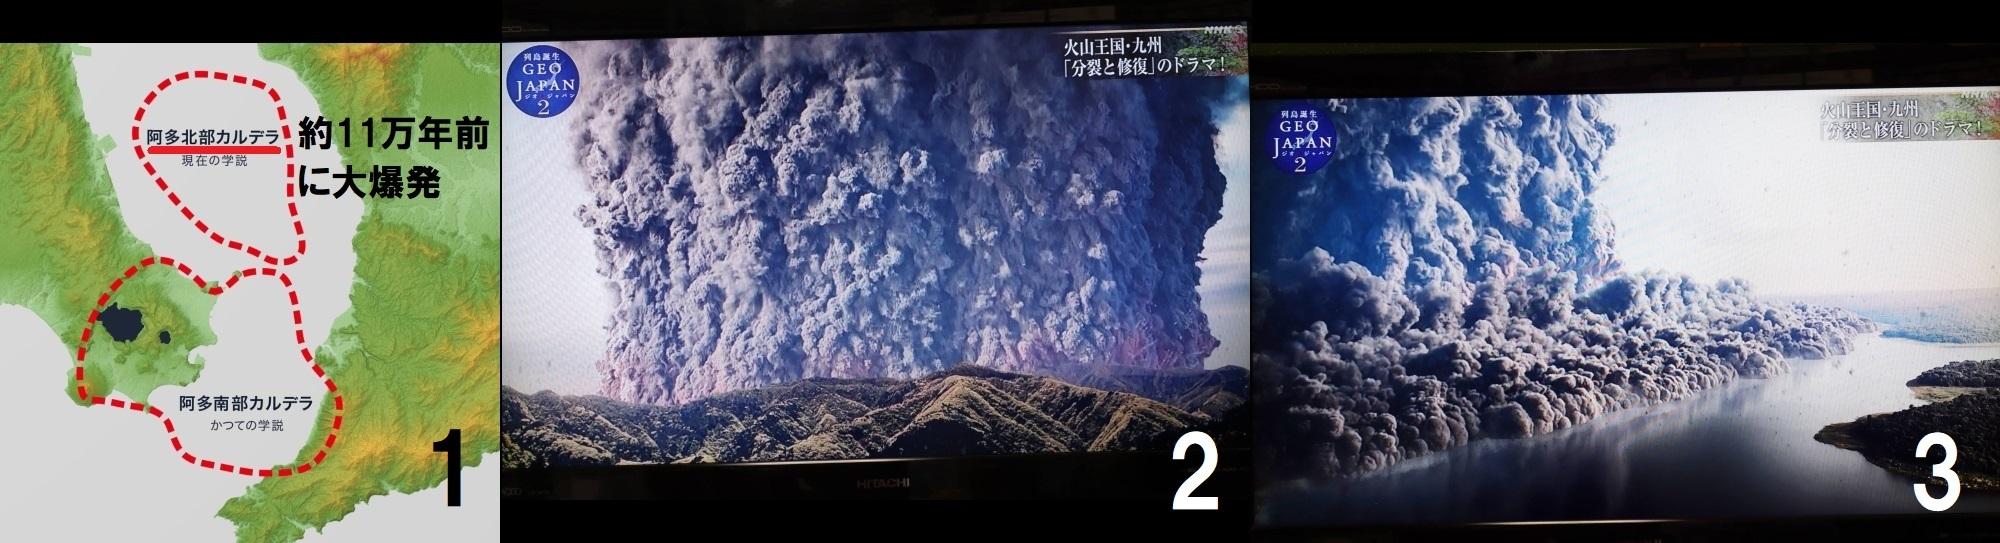 阿多北部カルデラ噴火3連結1_文字入